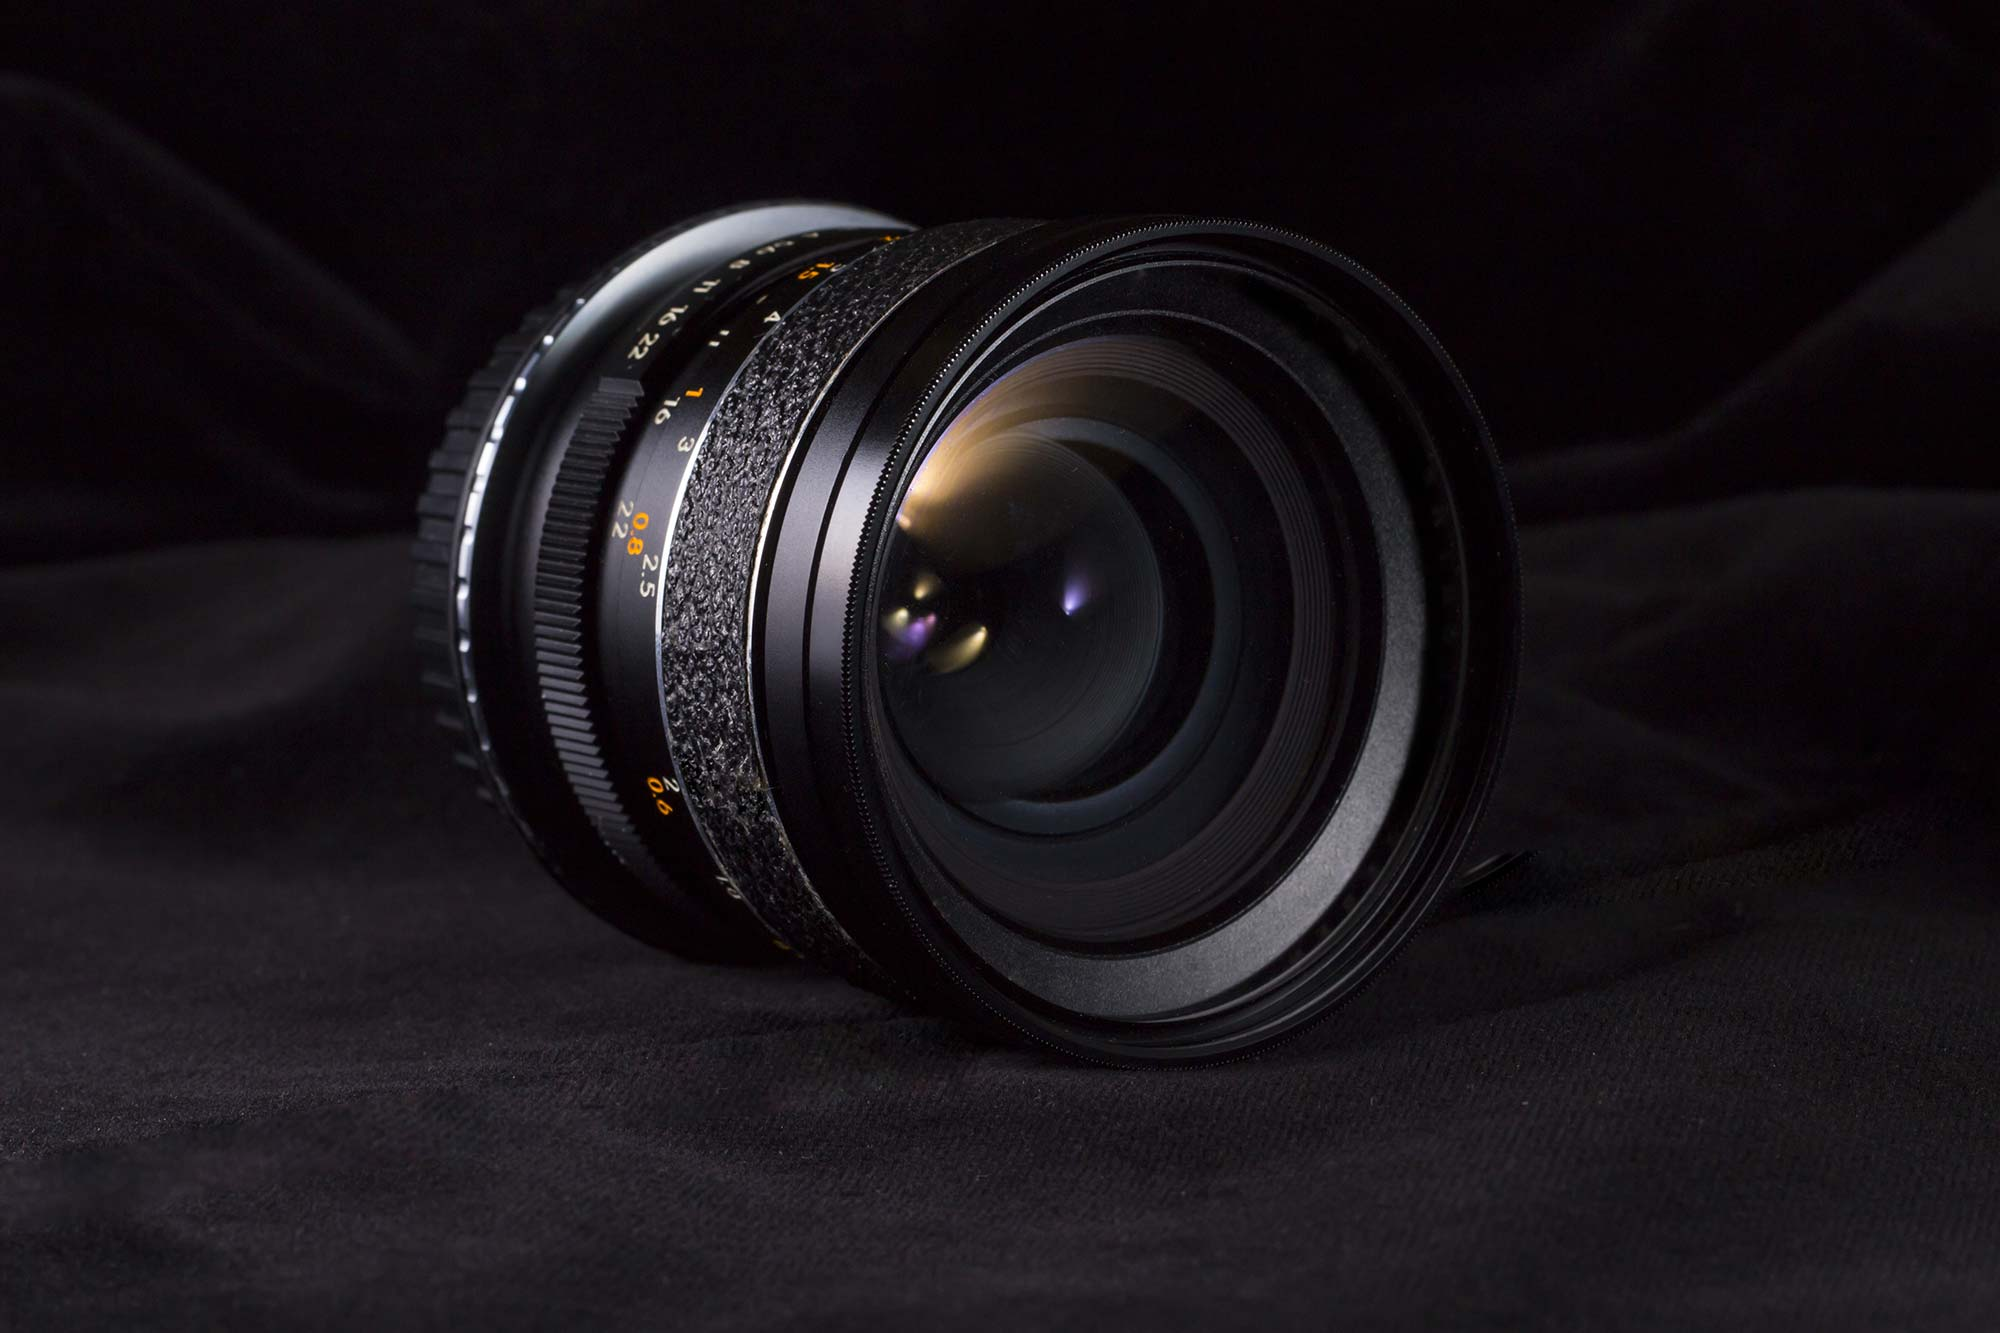 Best Lens For Nikon D80